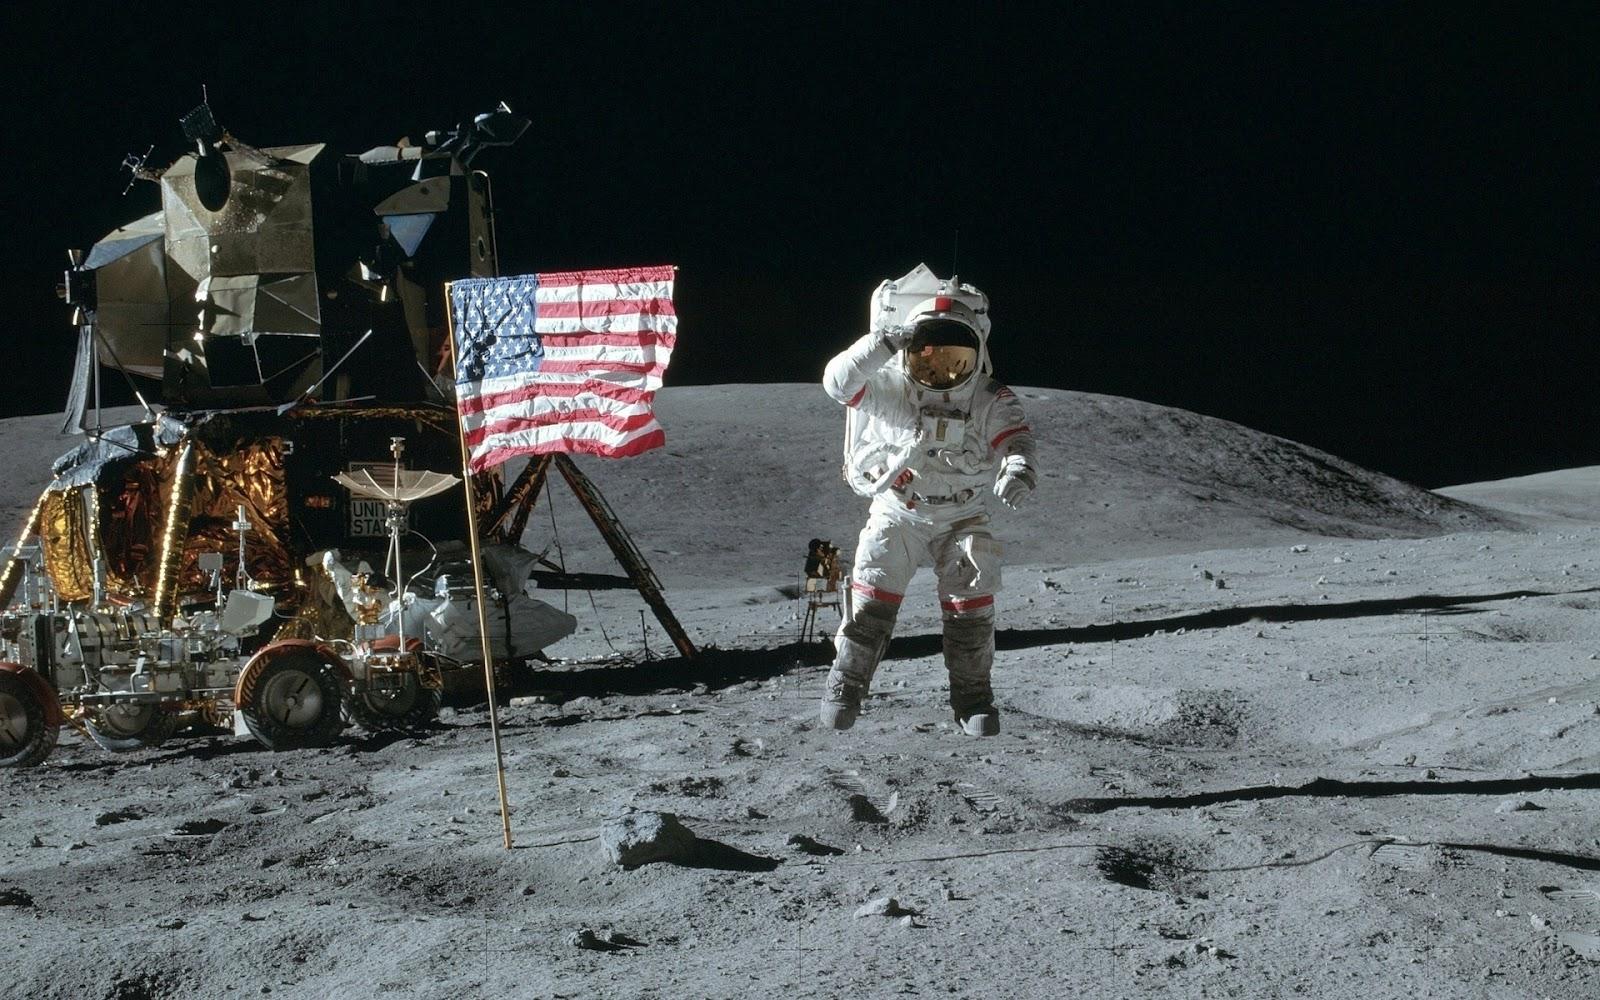 12. The Moon Landing